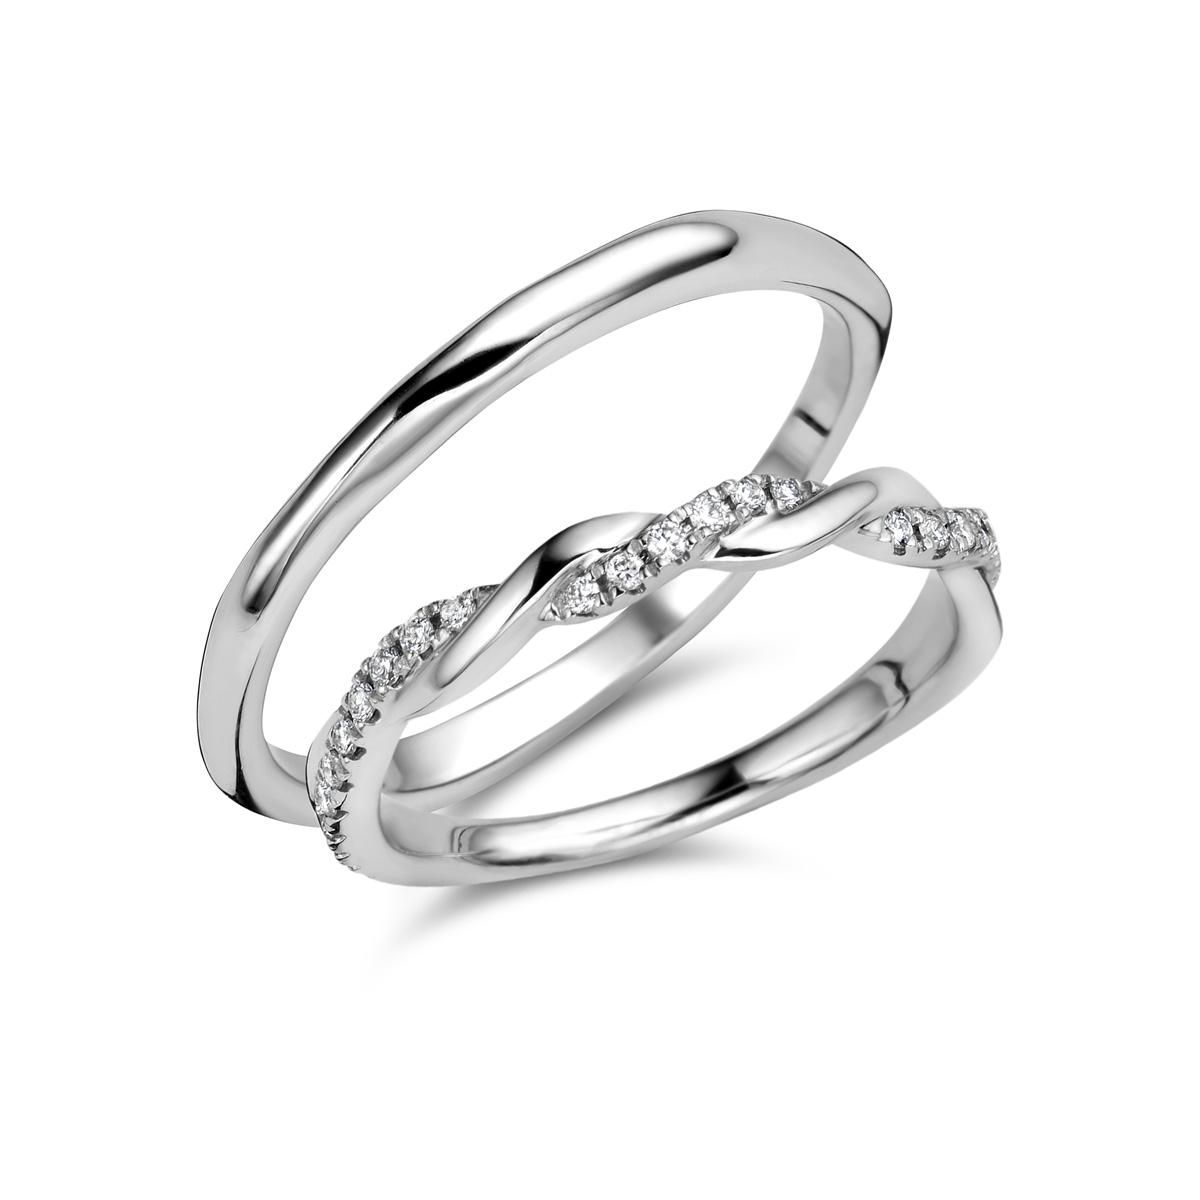 De Bruyloft trouwringen: B-RM182176-AD8825_W7